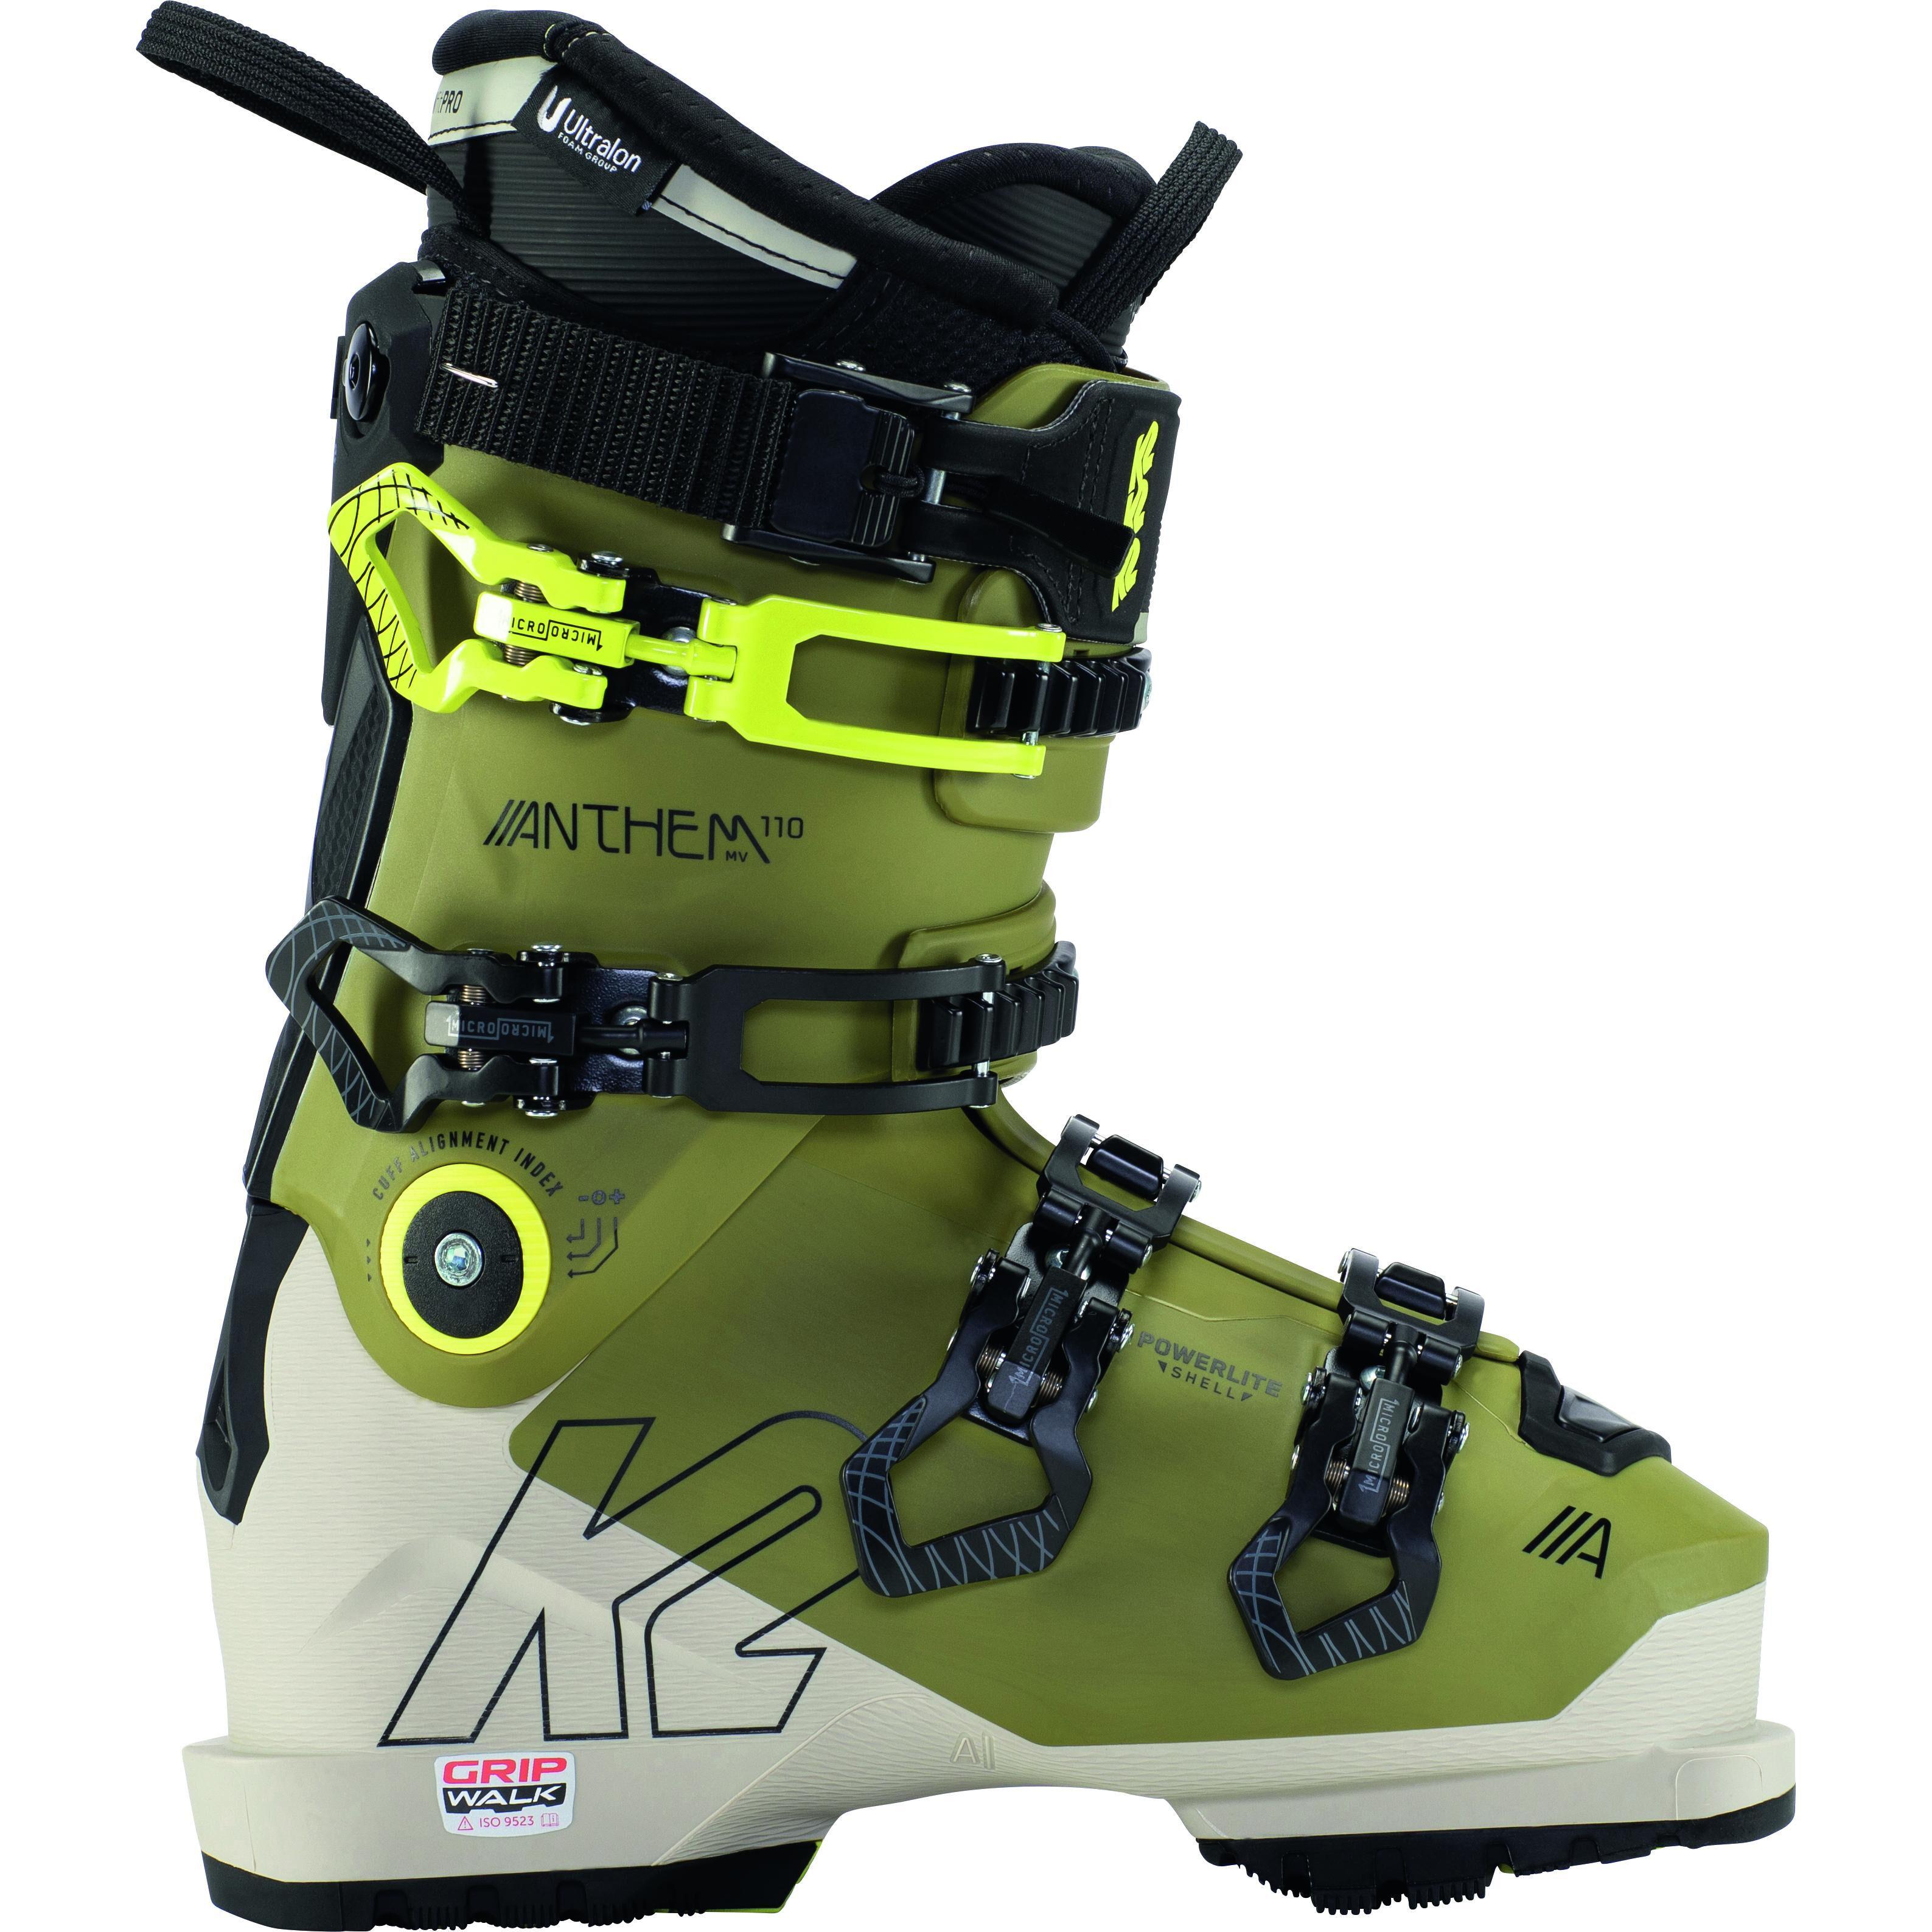 k2 Chaussures De Ski K2 Anthem 110 Mv Gripwalk Green-khaki Femme